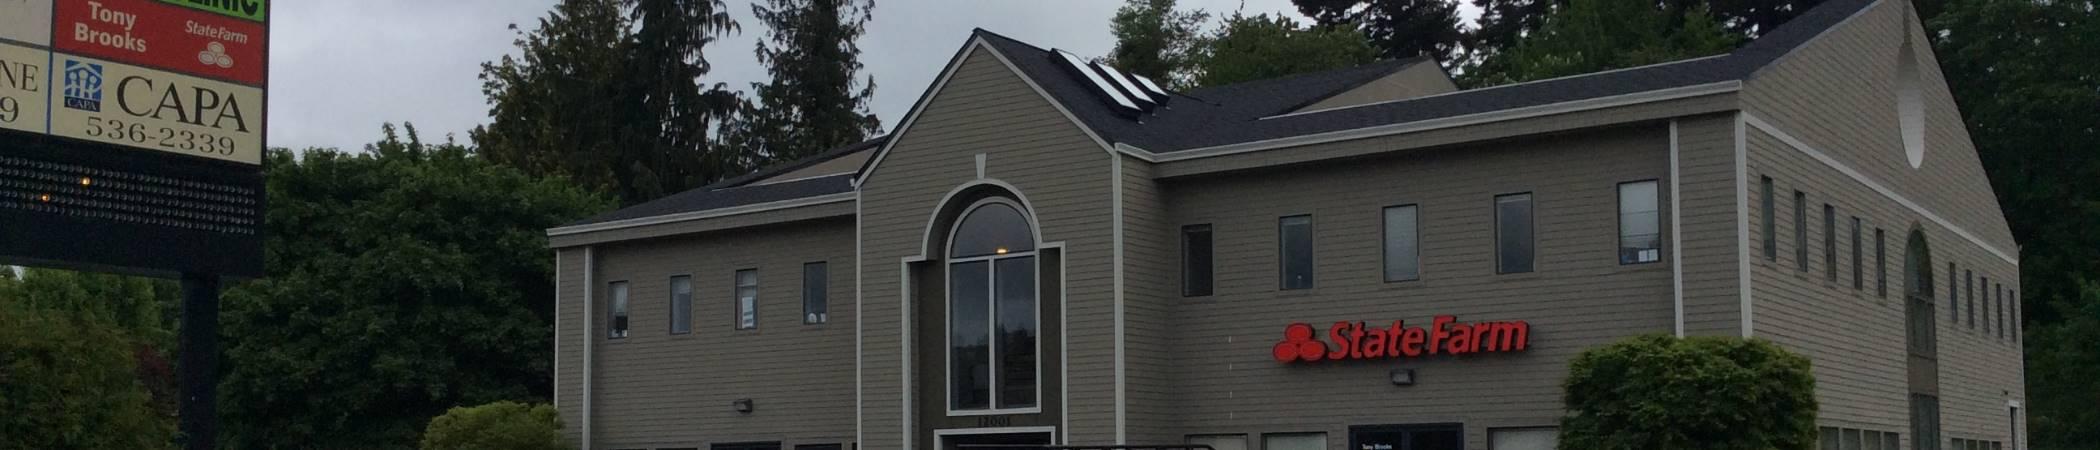 Tony Brooks State Farm Insurance in Tacoma, WA | Home, Auto Insurance & more